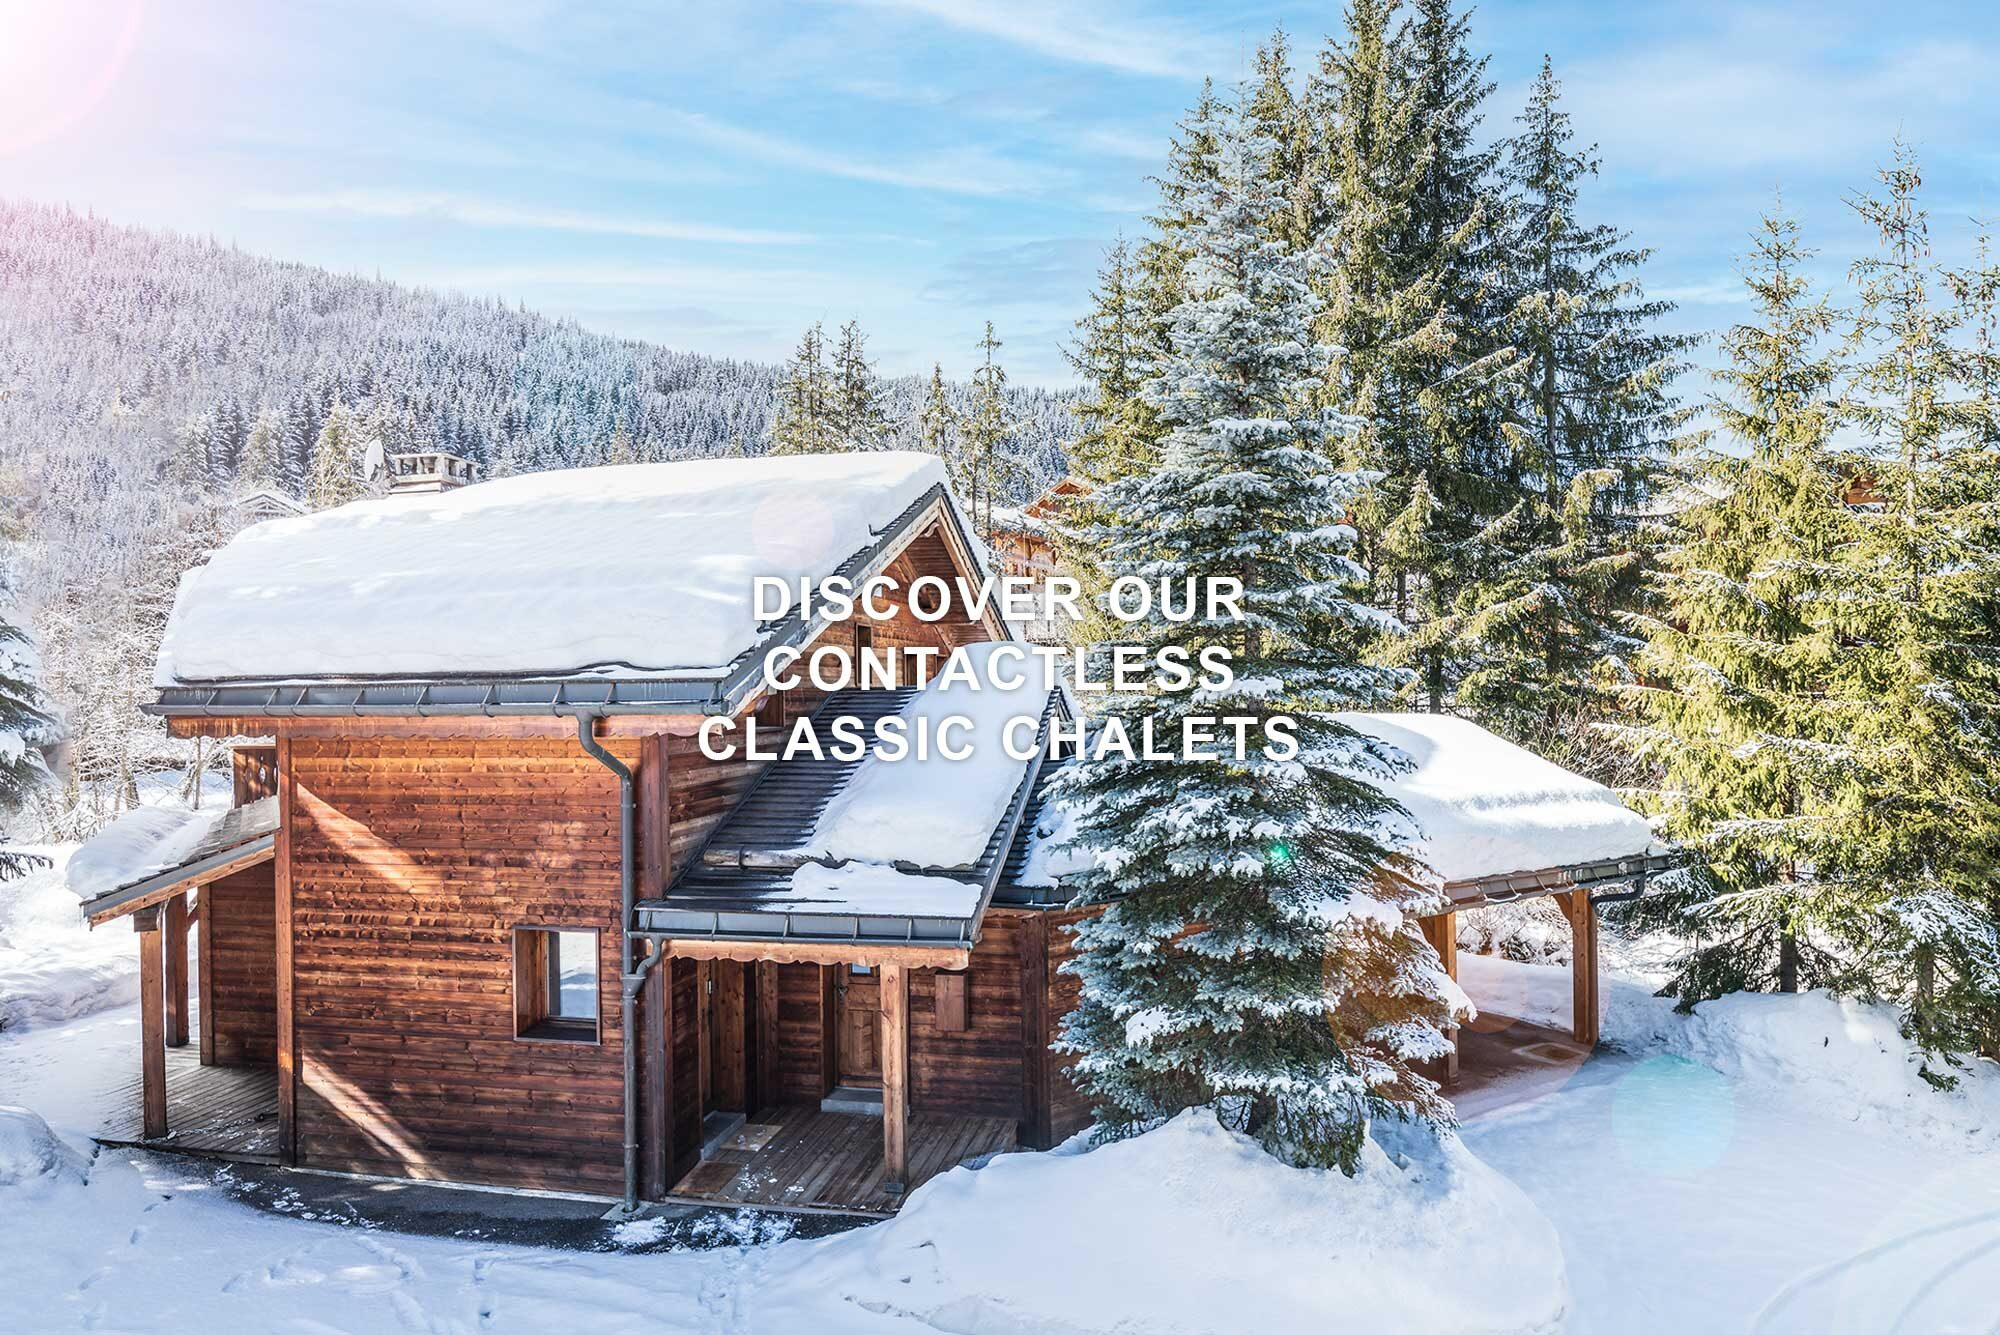 Home - Ski France Classic